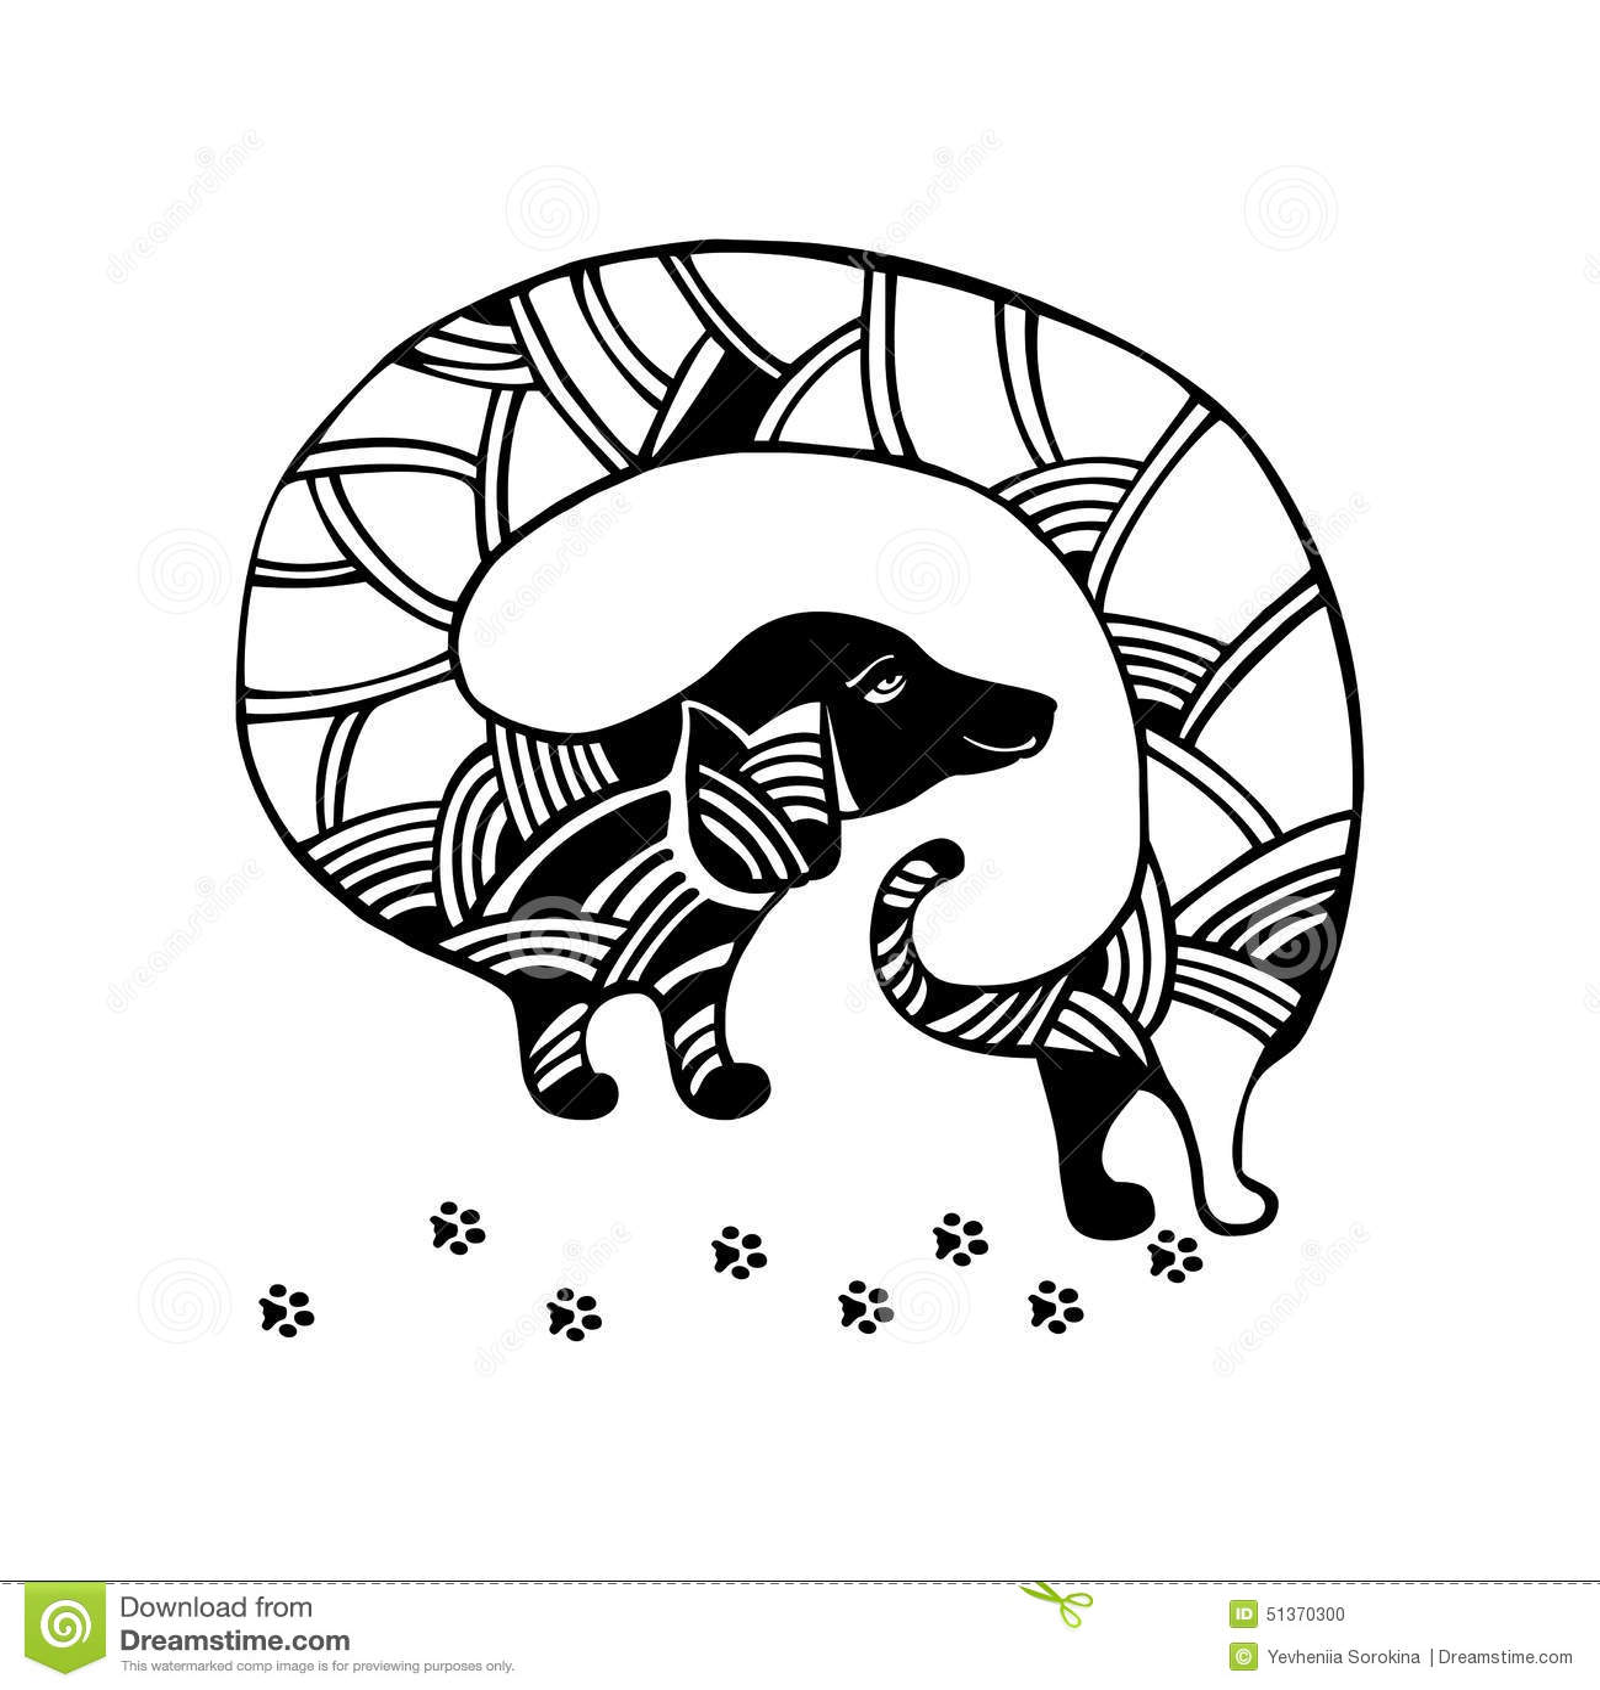 Dachshund Dog Vector Cartoon Illustration Stock Vector